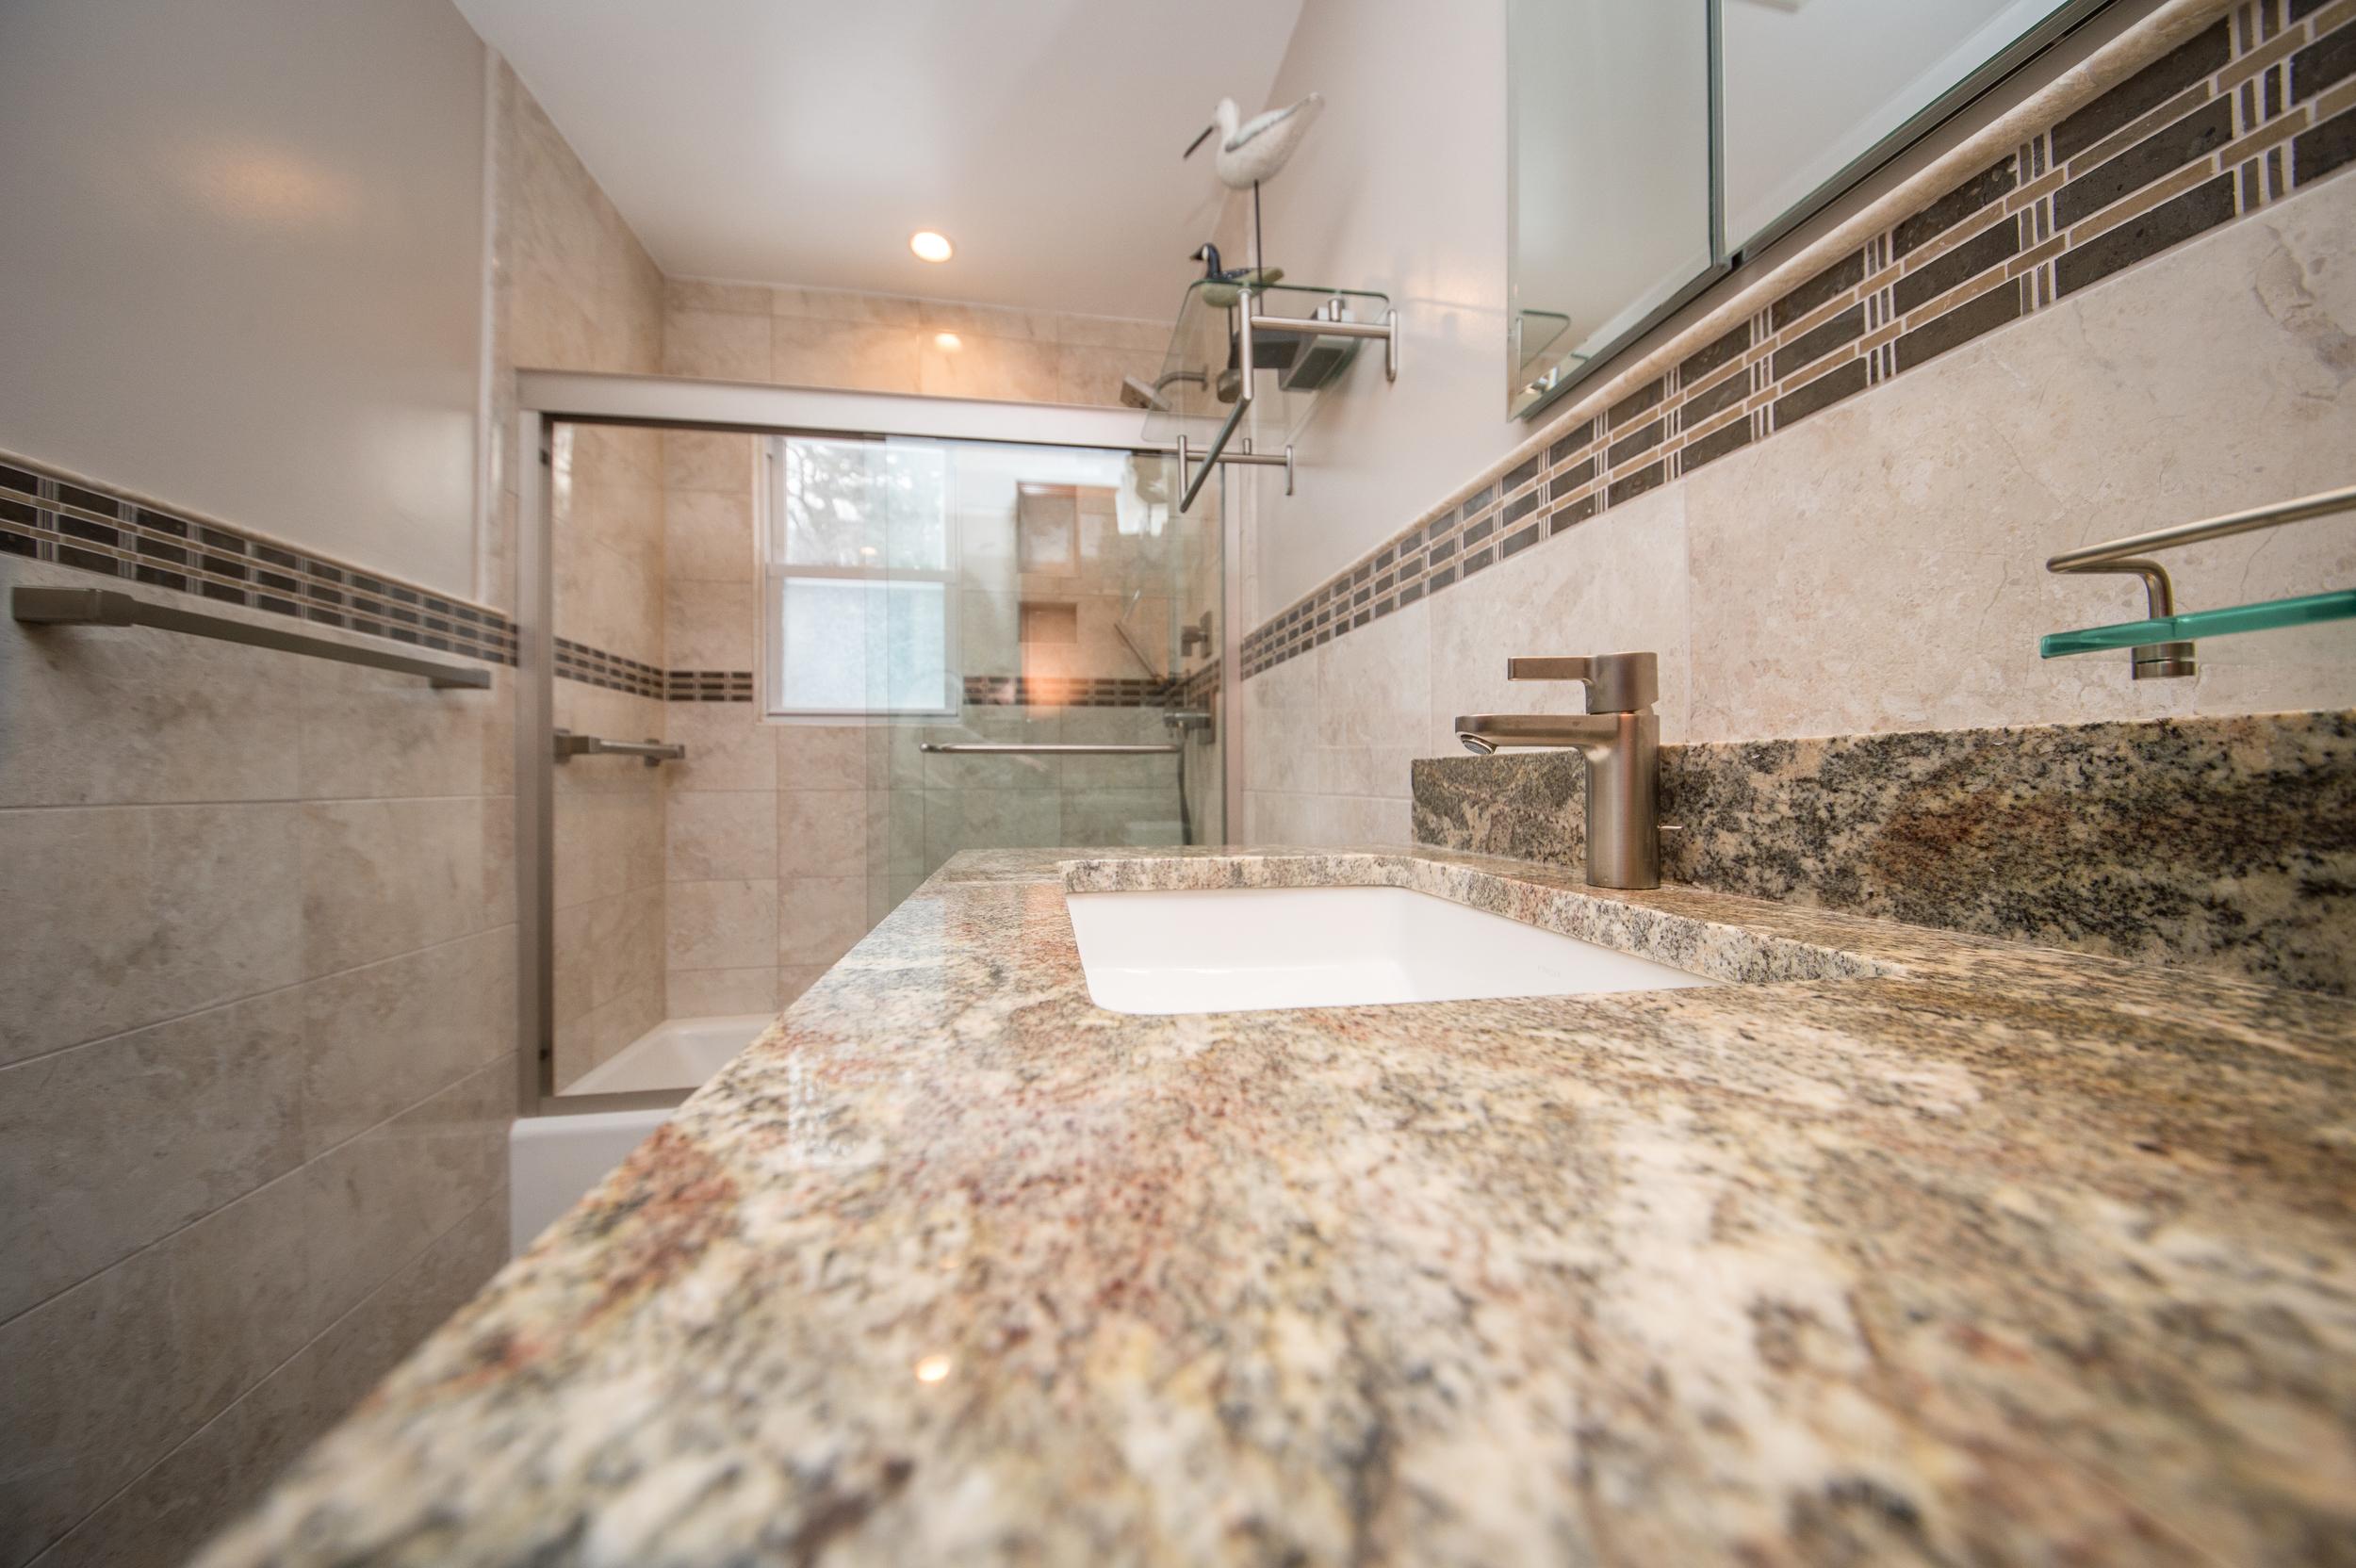 Bathroom Remodel Townson, MD